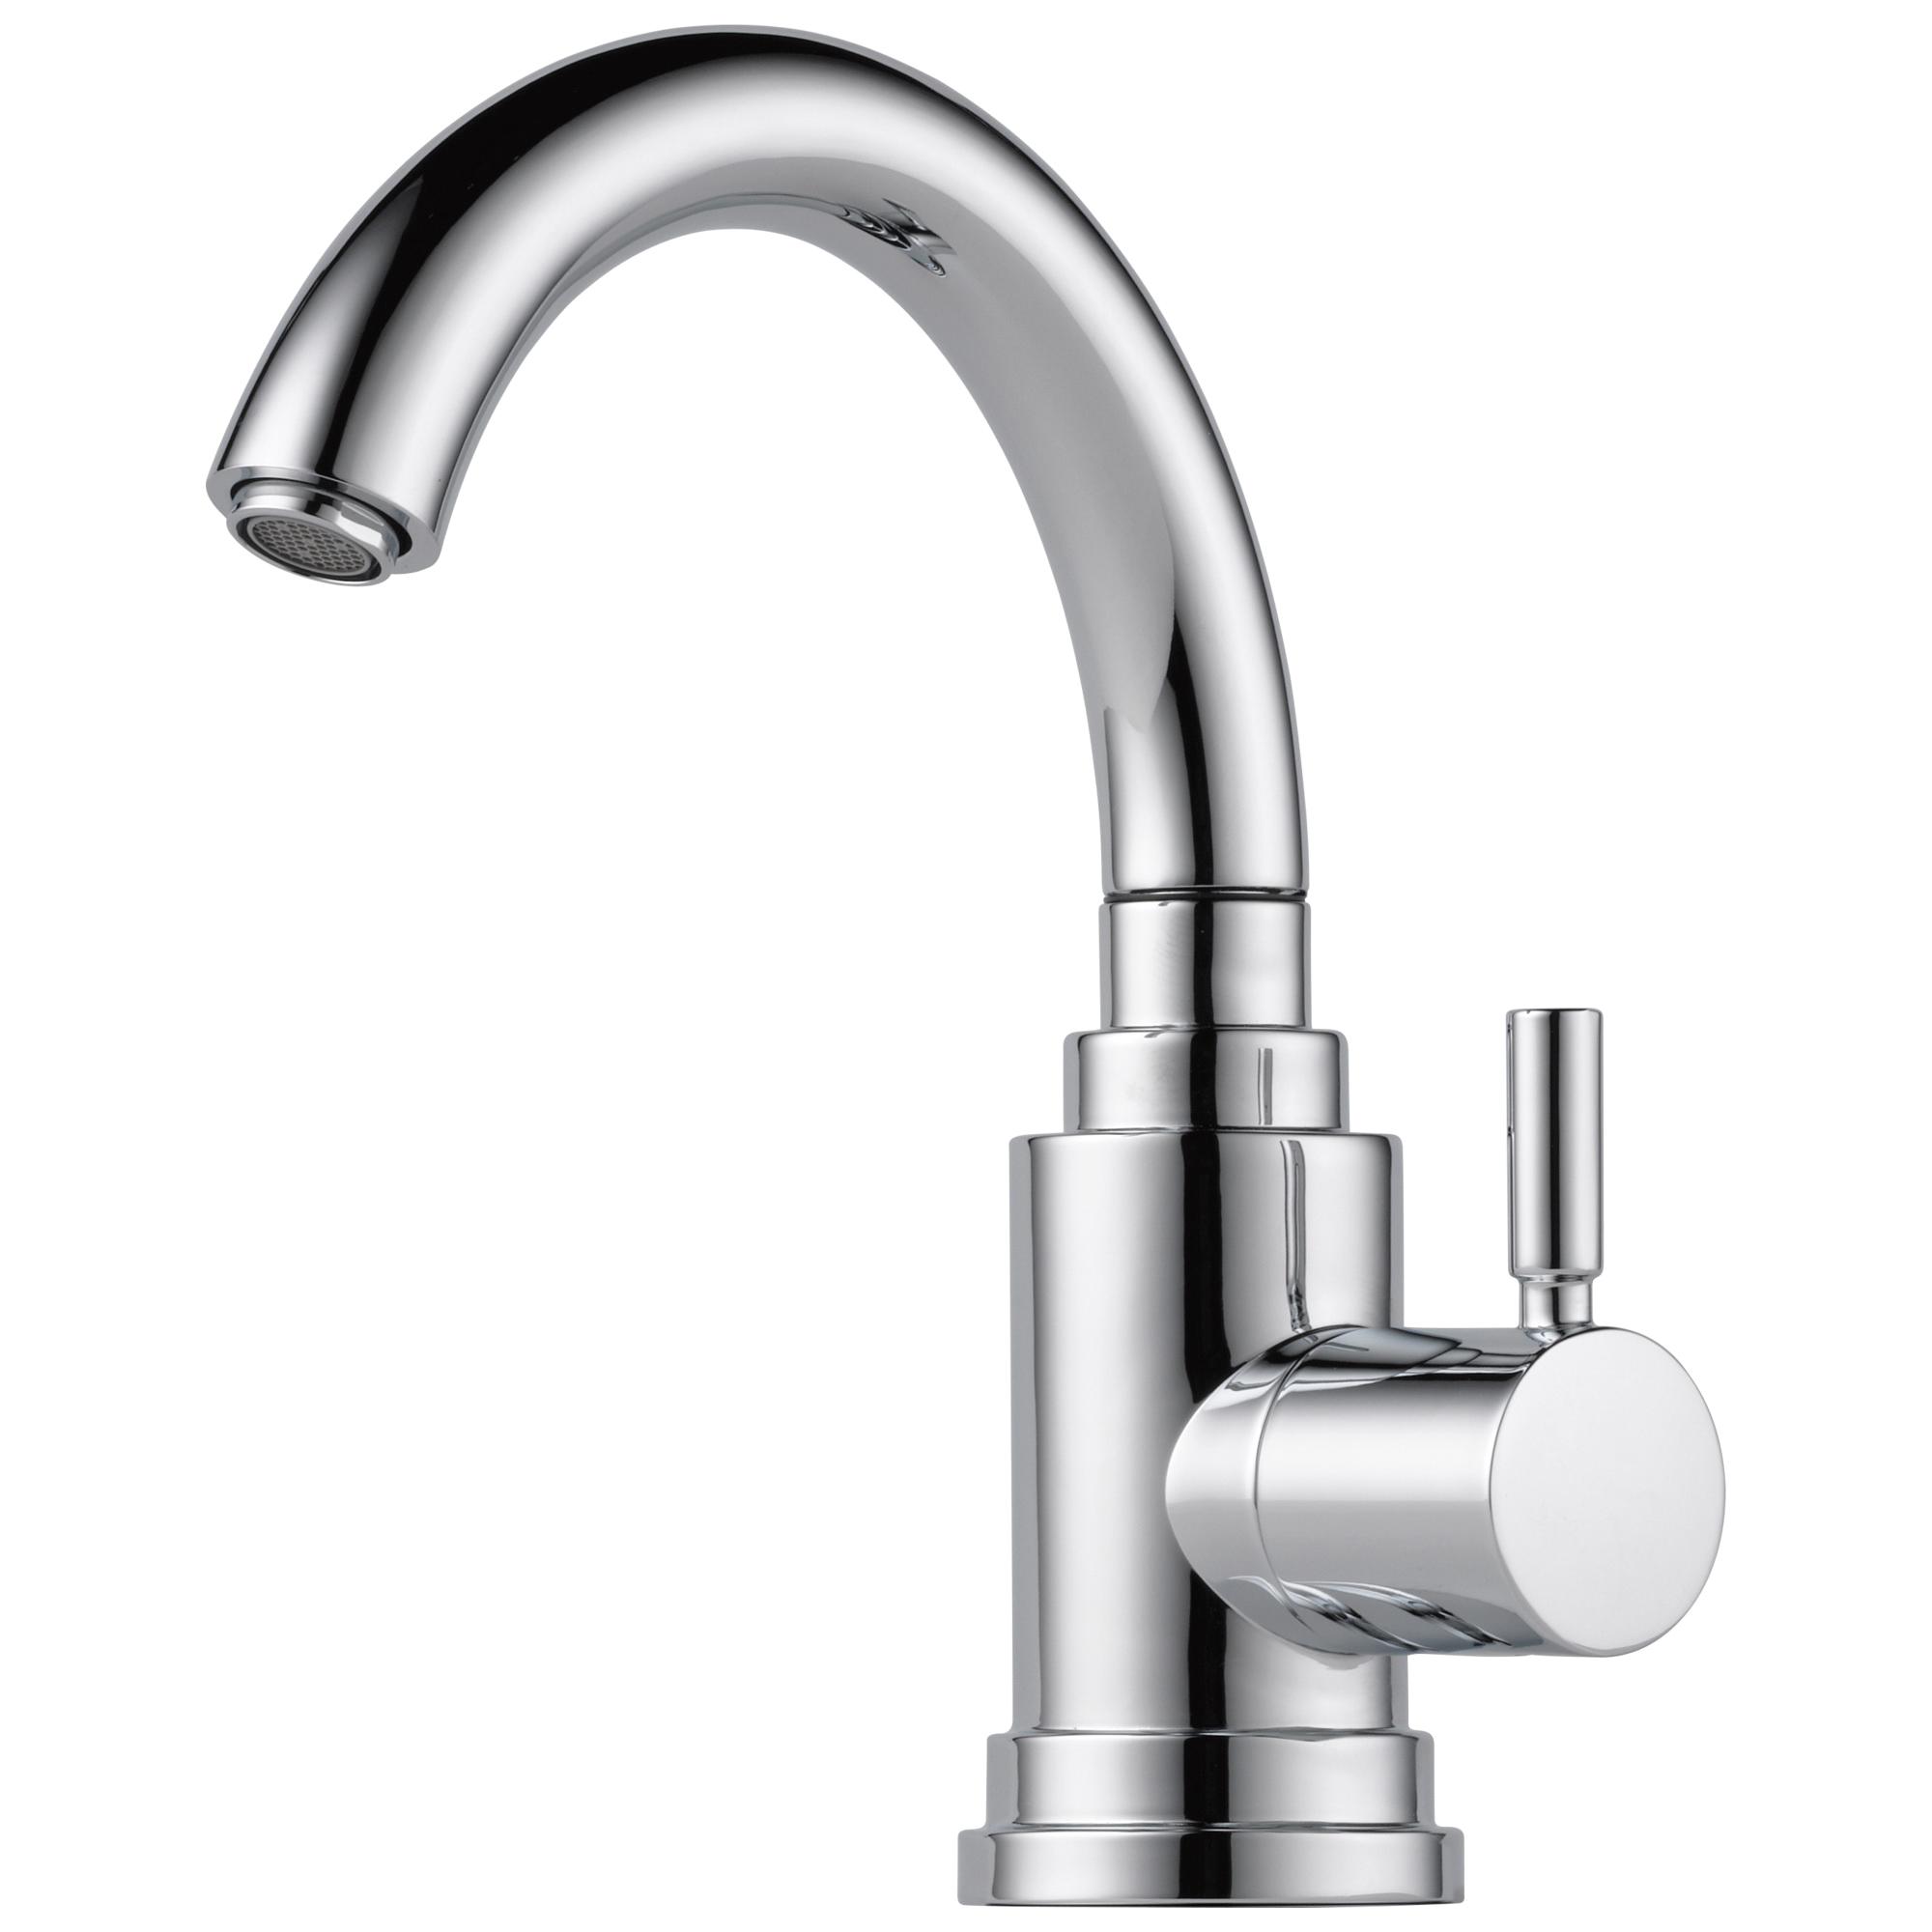 Brizo® 61320LF-PC Euro Beverage Faucet, 1.5 gpm Flow Rate, Polished Chrome, 1 Handles, Domestic